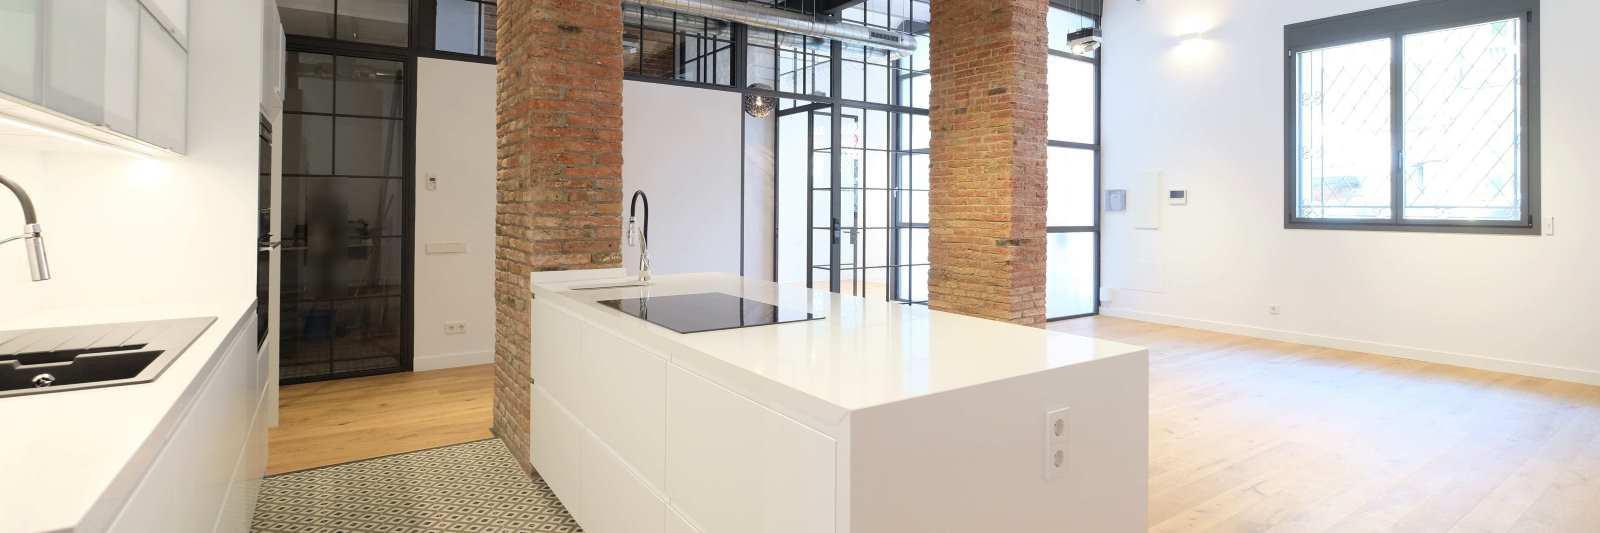 MG Inmobiliaria Barcelona - sant-gervasi-marco-aurelio